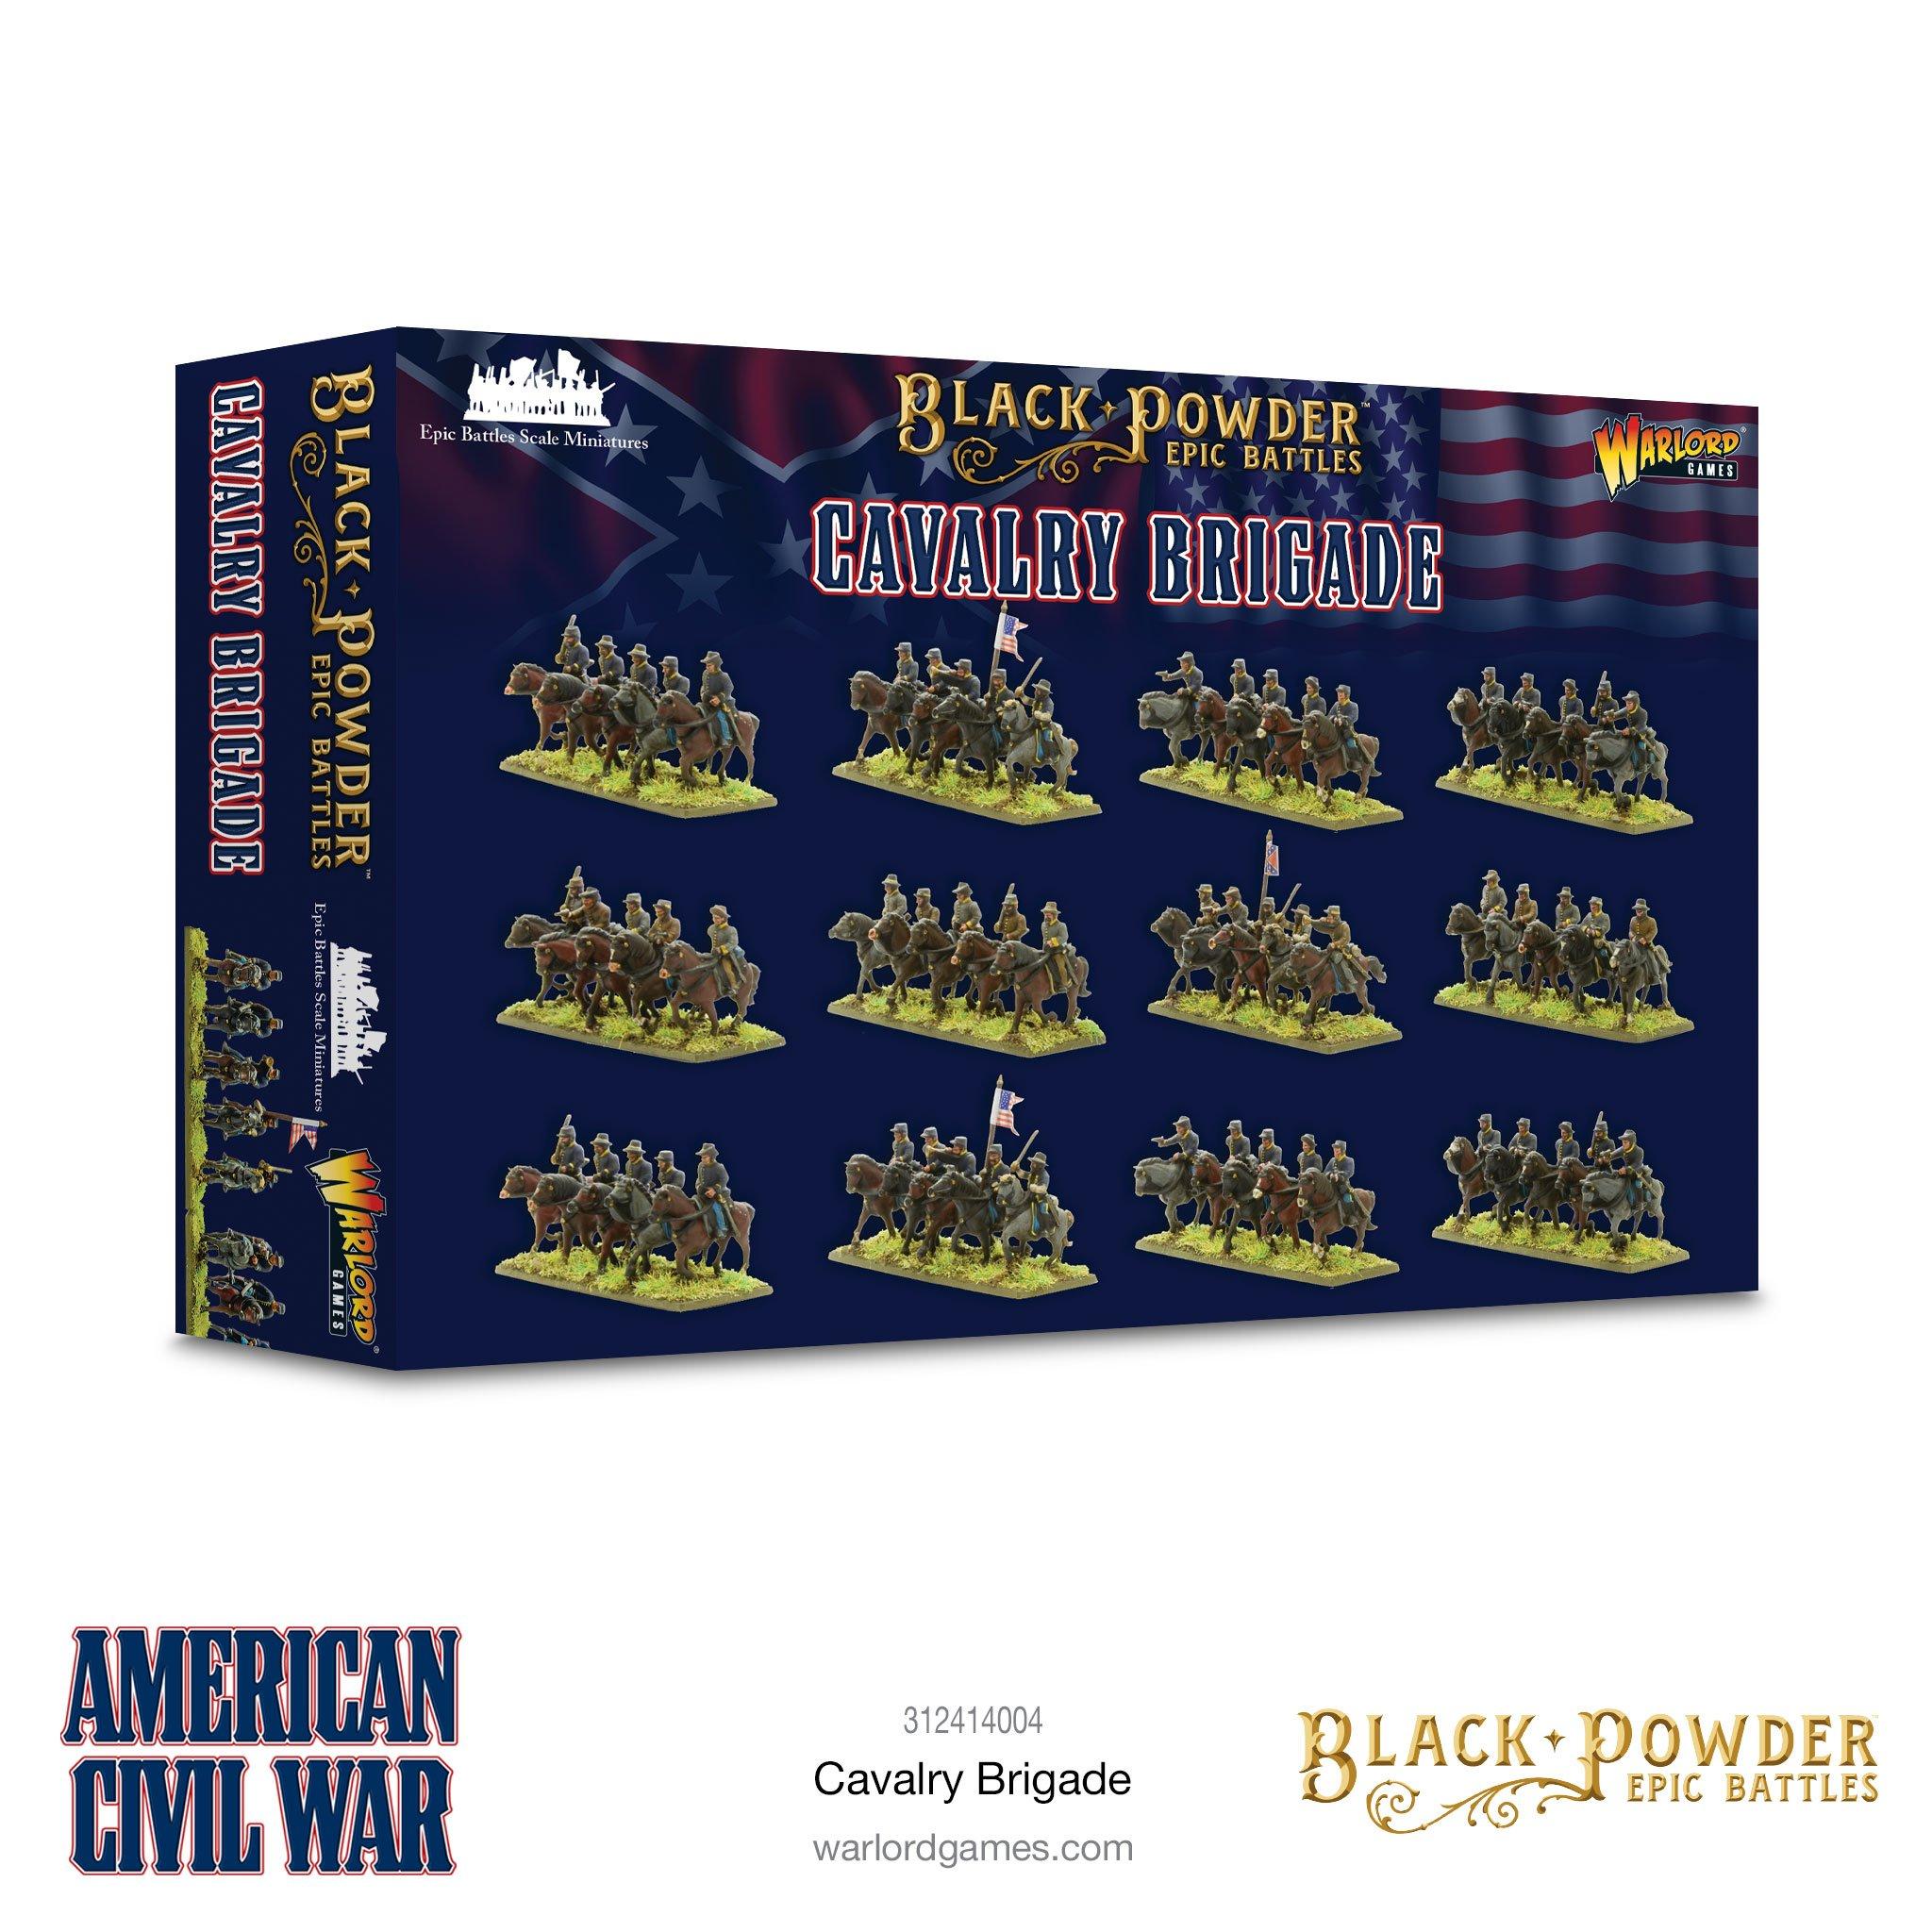 Black Powder Epic Battles : ACW Cavalry Brigade